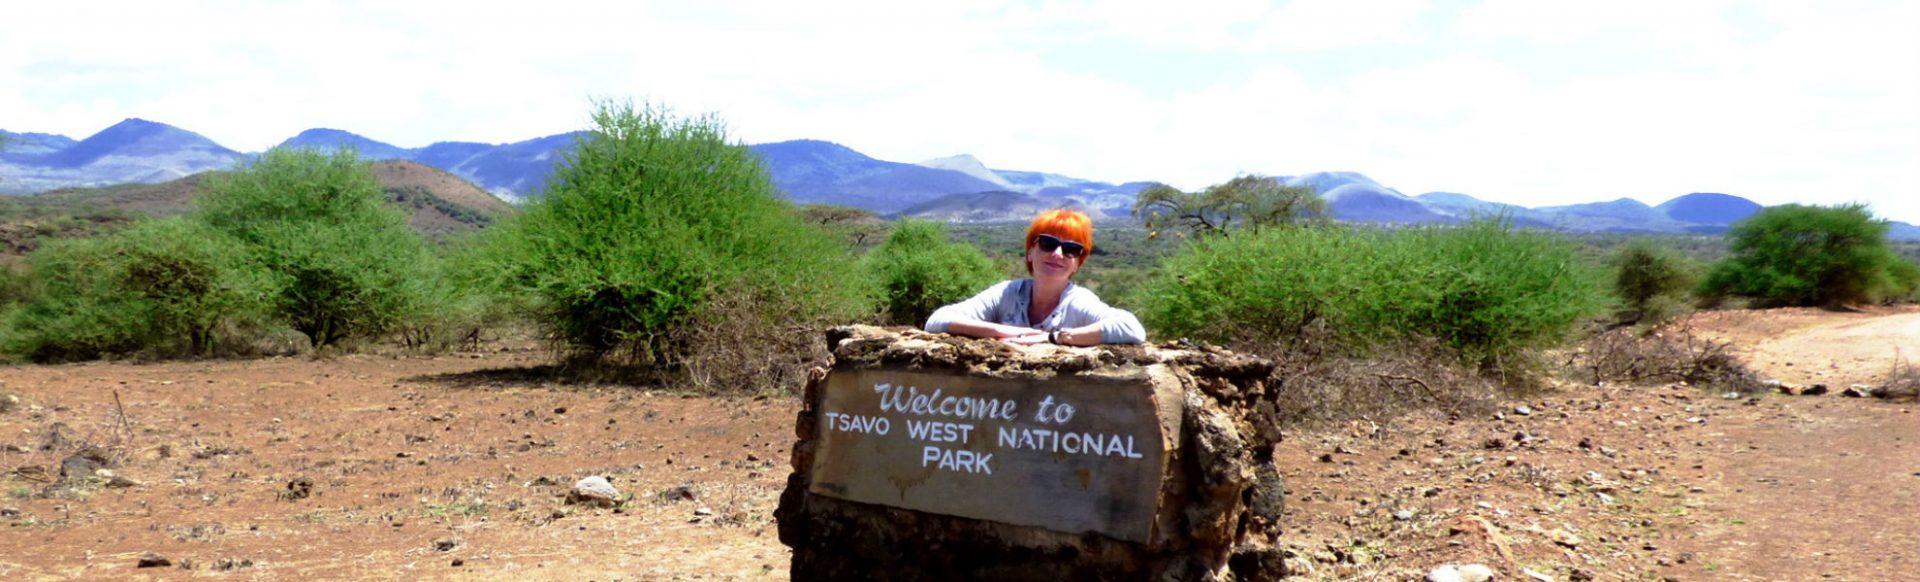 Marina Schmidt, KeniaSpezialist Reisekontor Schmidt, im Tsavo West Nationalpark Kenia